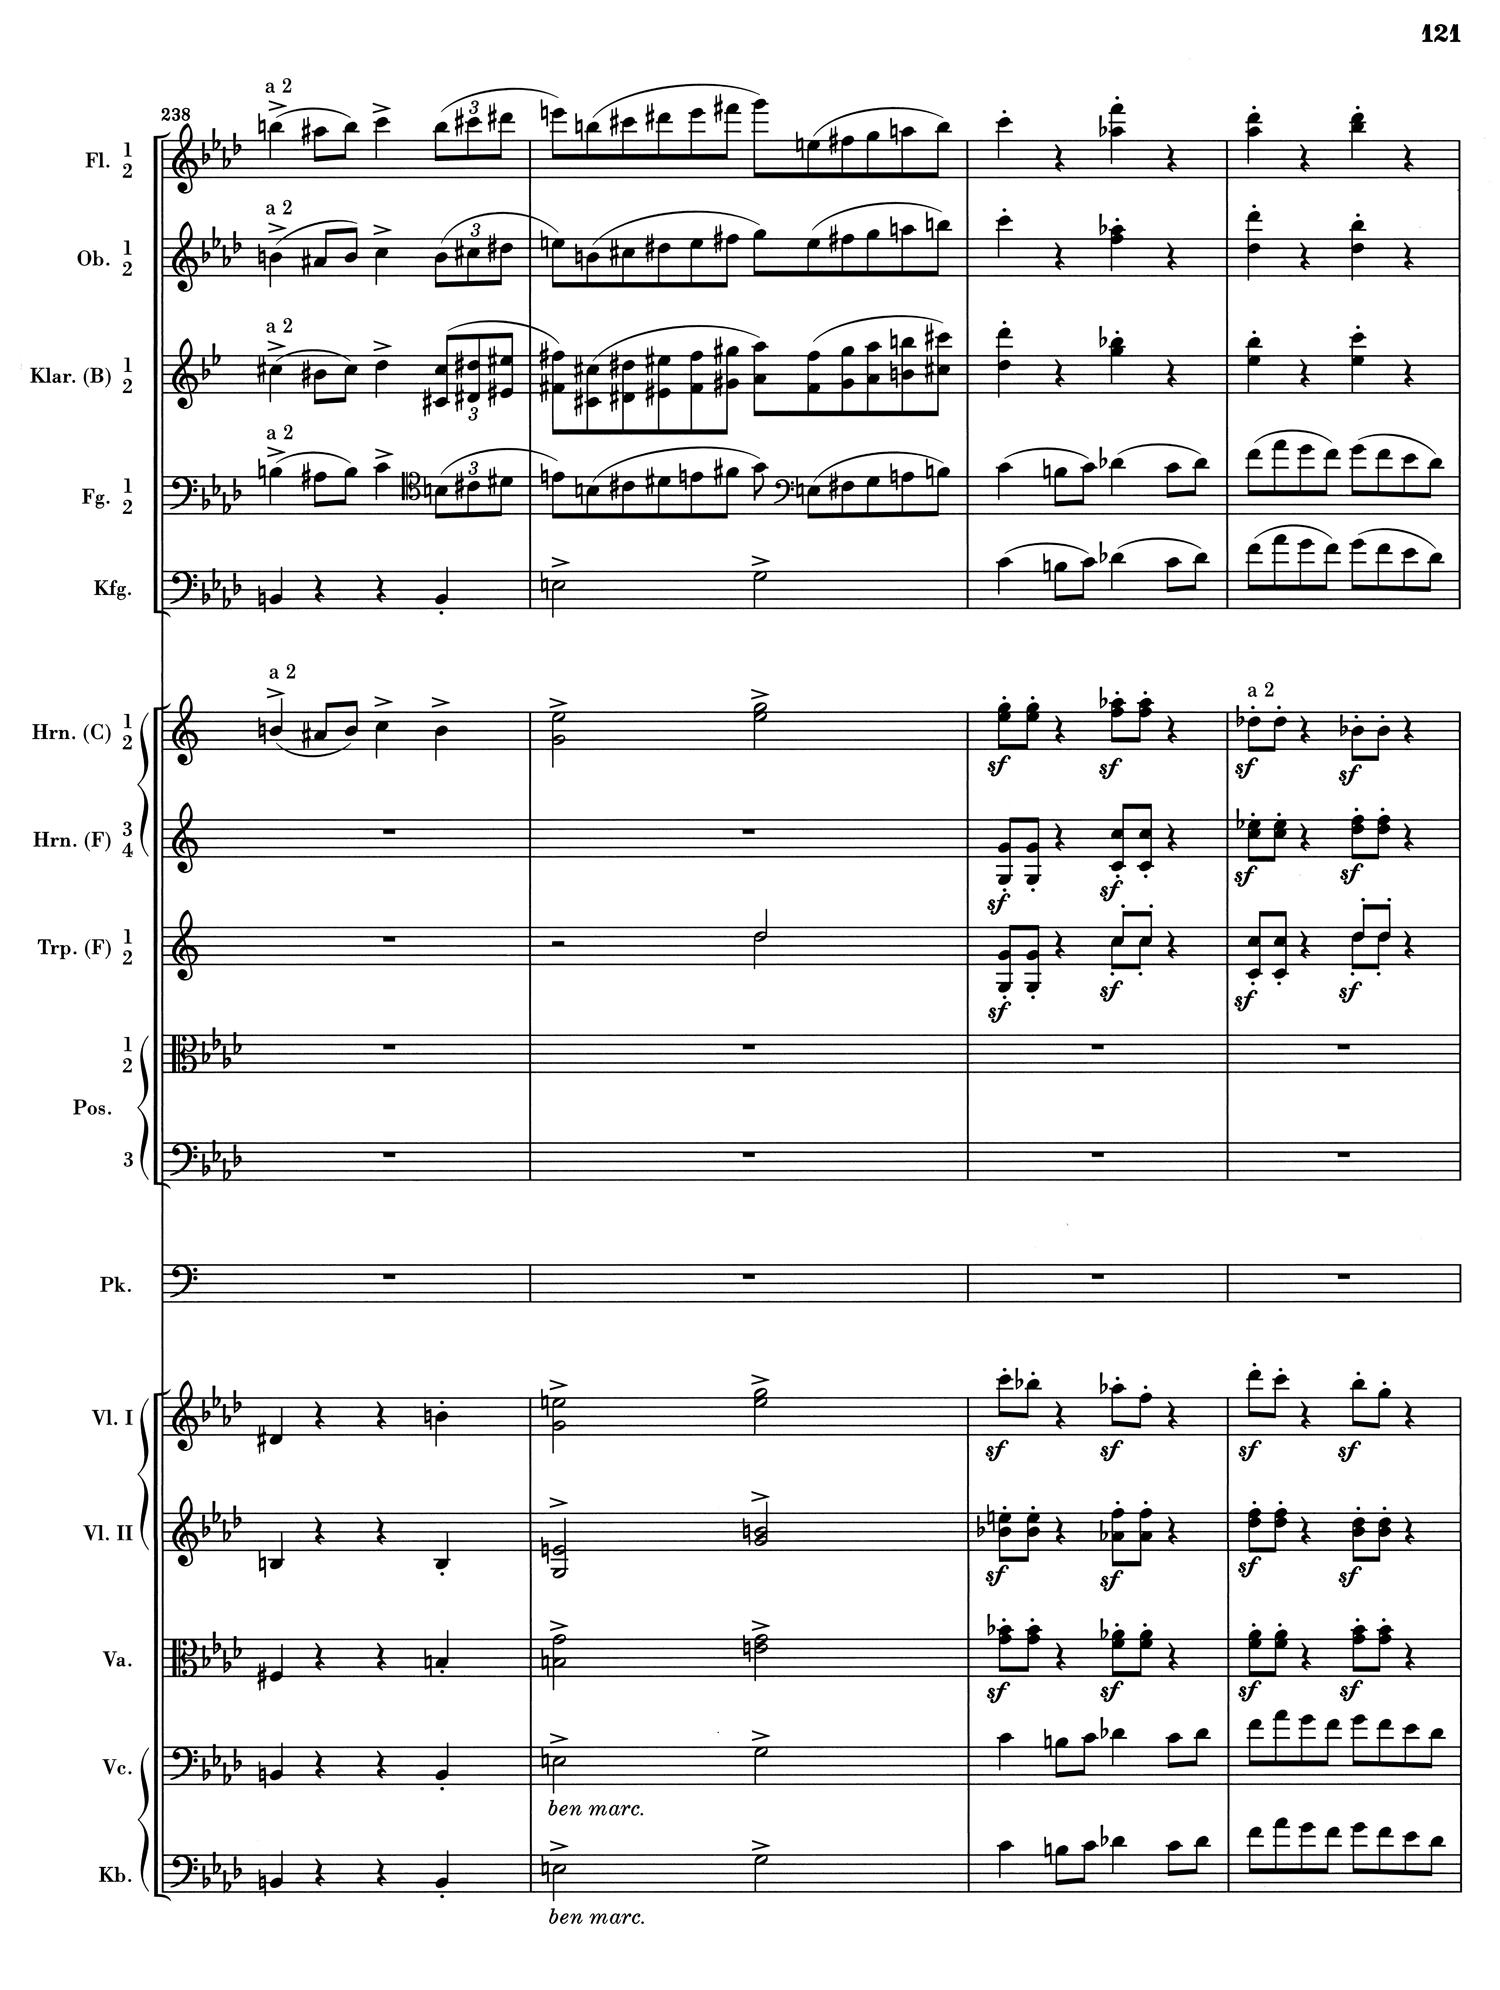 Brahms 3 Score 14.jpg